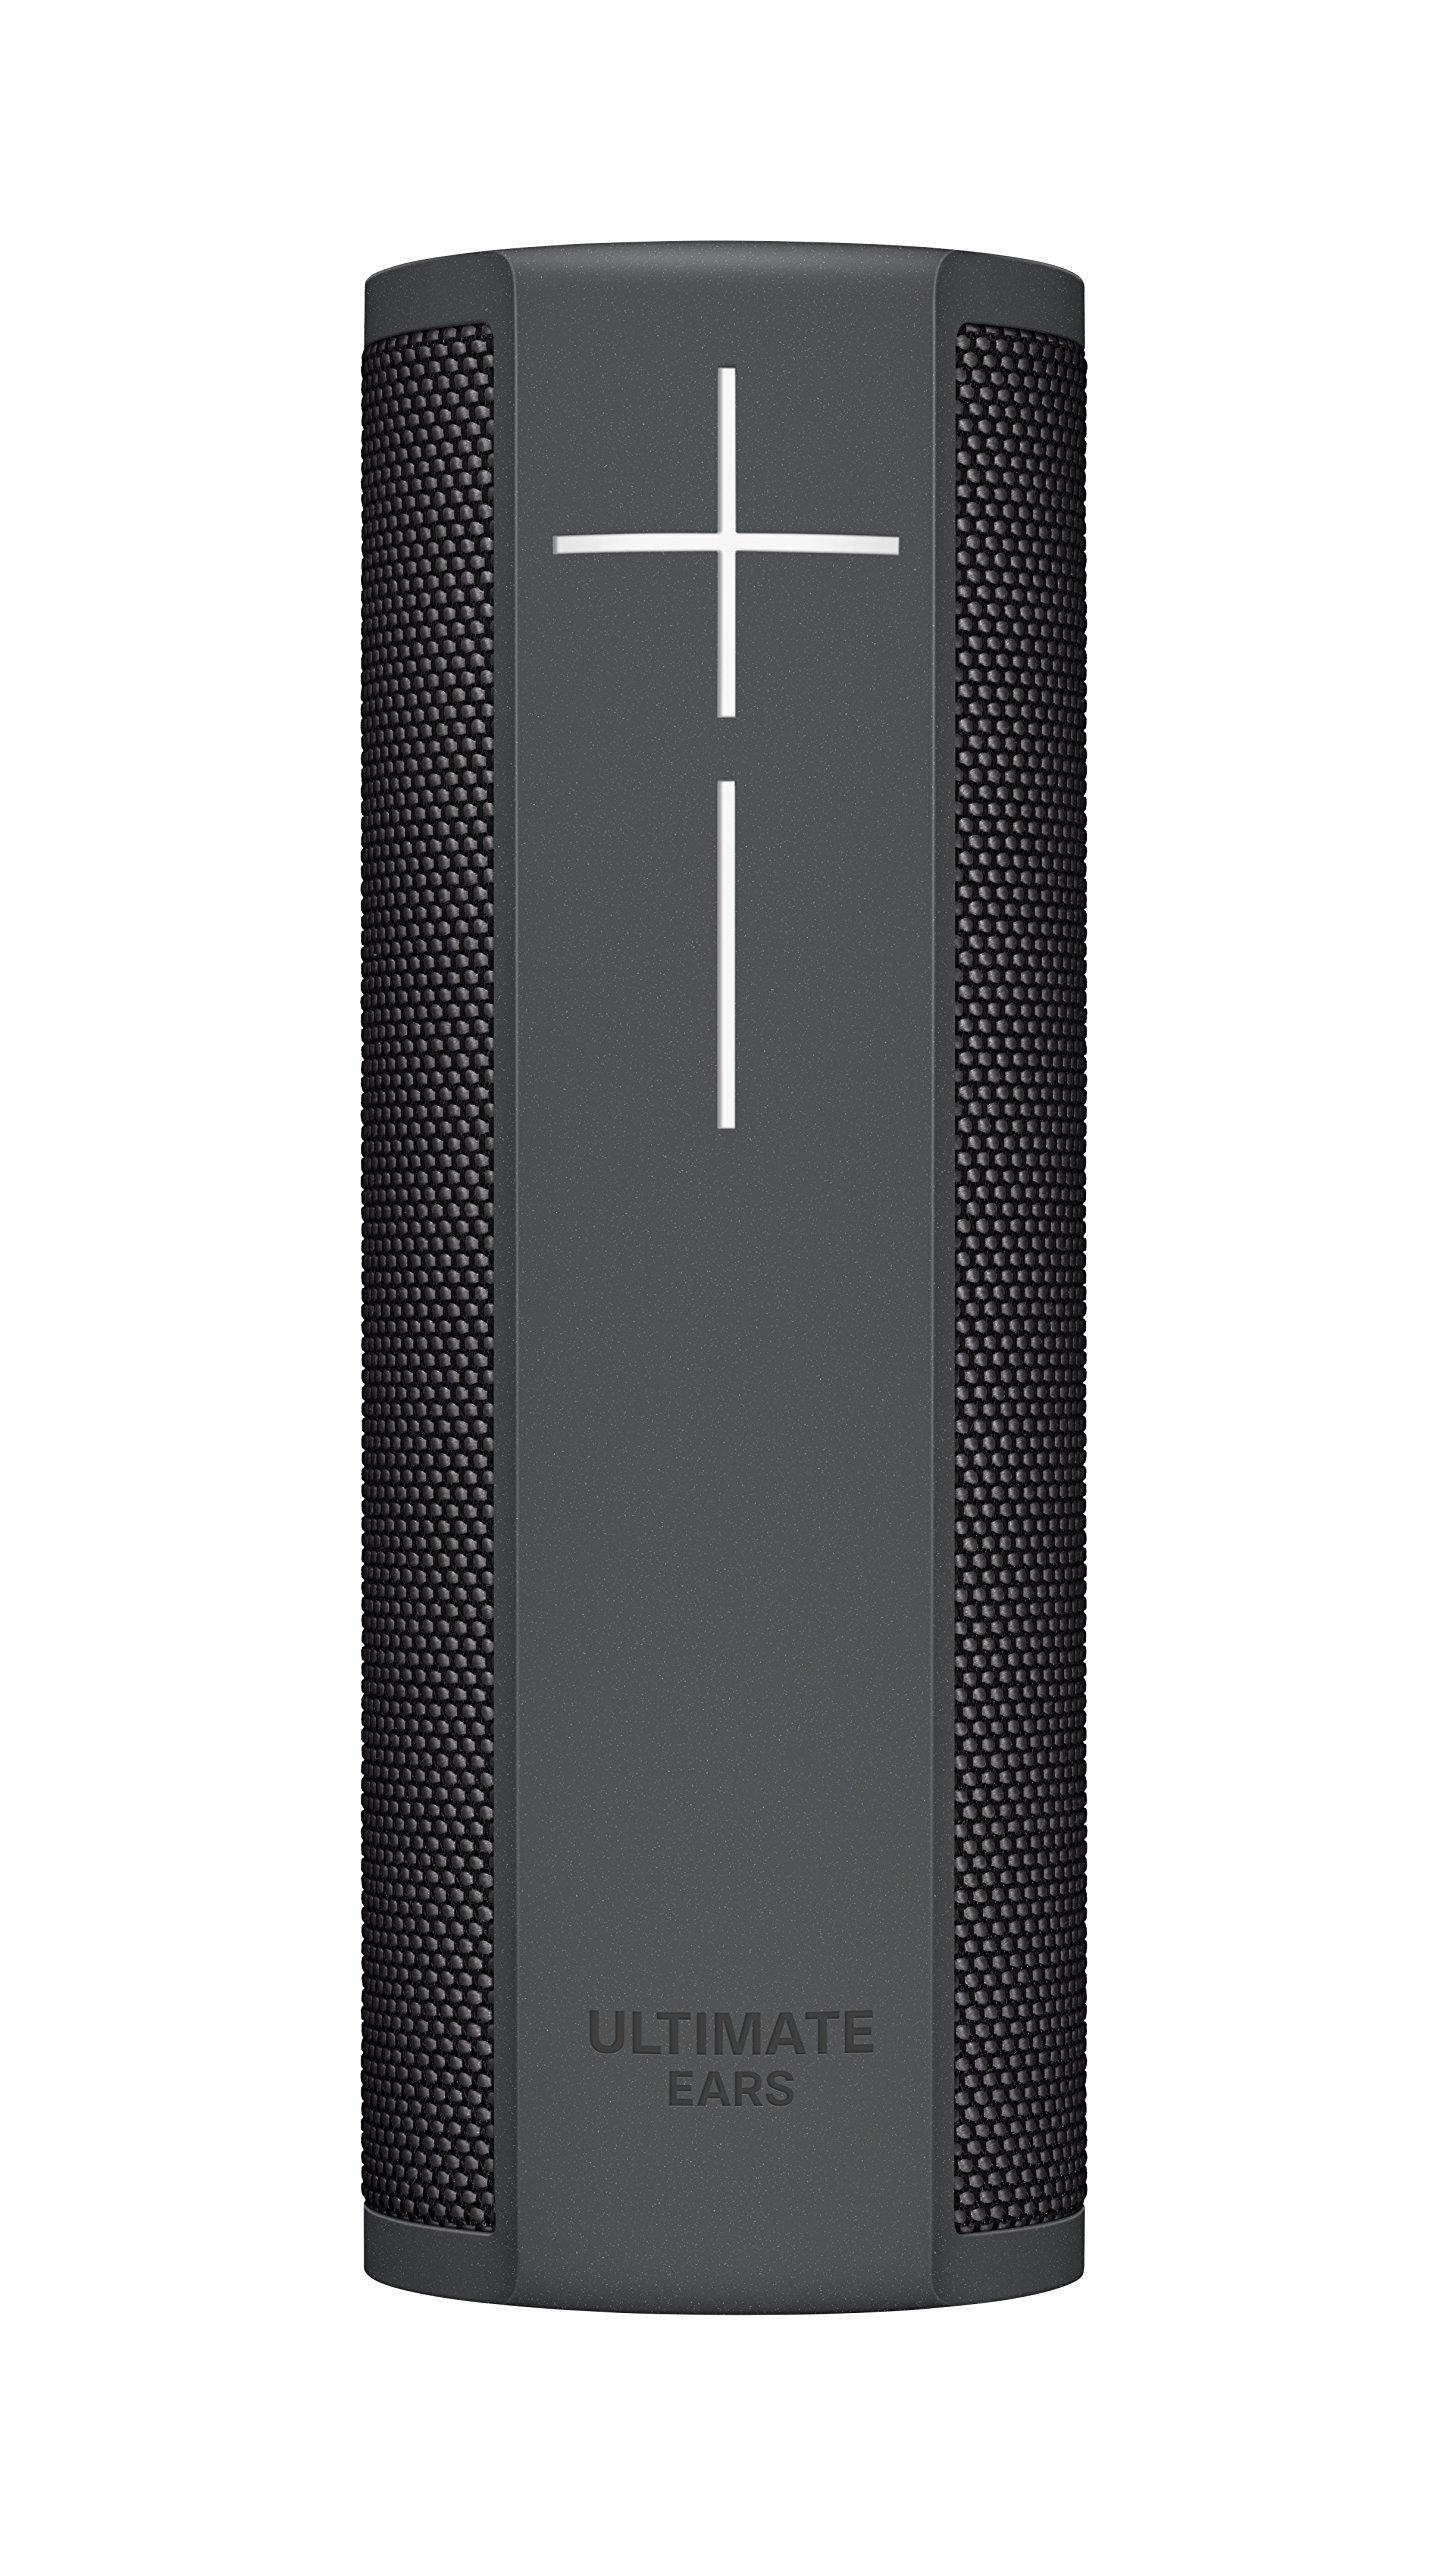 Ultimate Ears BLAST Portable Wi-Fi / Bluetooth Speaker with hands-free Amazon Alexa voice control (waterproof) - Graphite Black